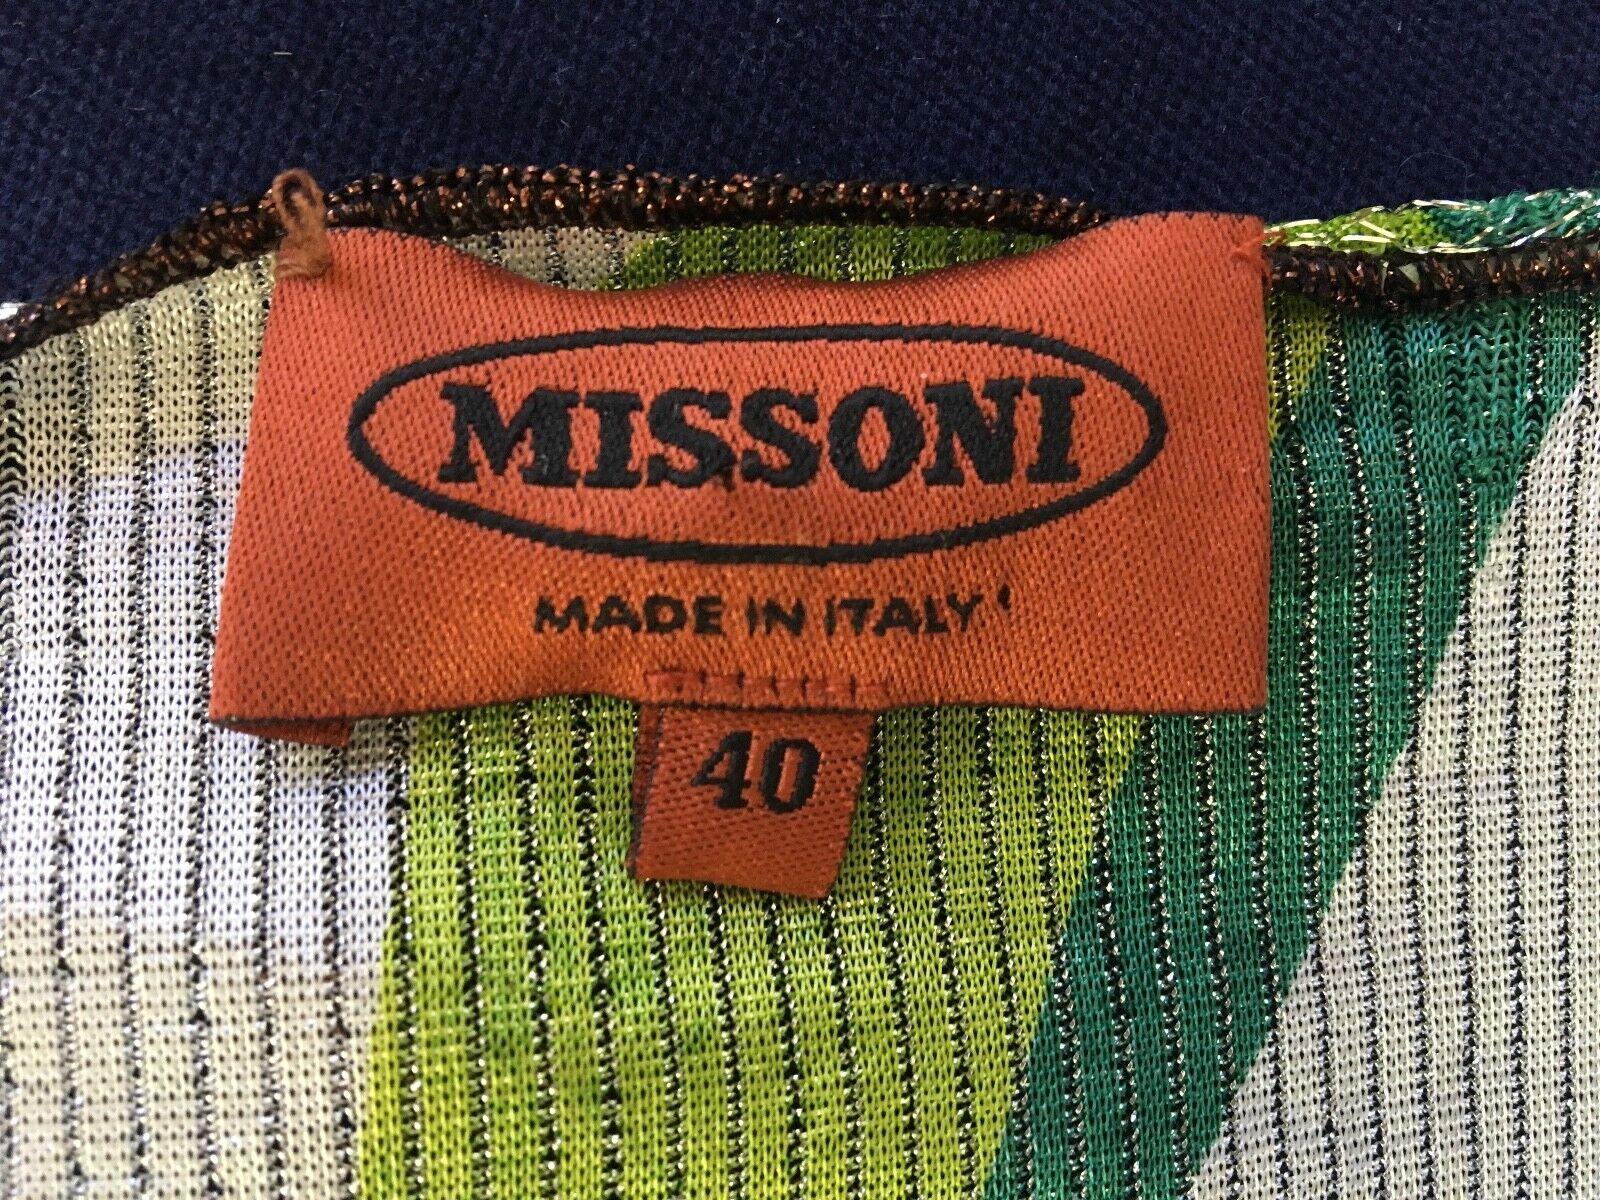 Metallic Metallic Metallic multi color MISSONI orange label wrap top cardigan, size 40 (S M) 15f8a6